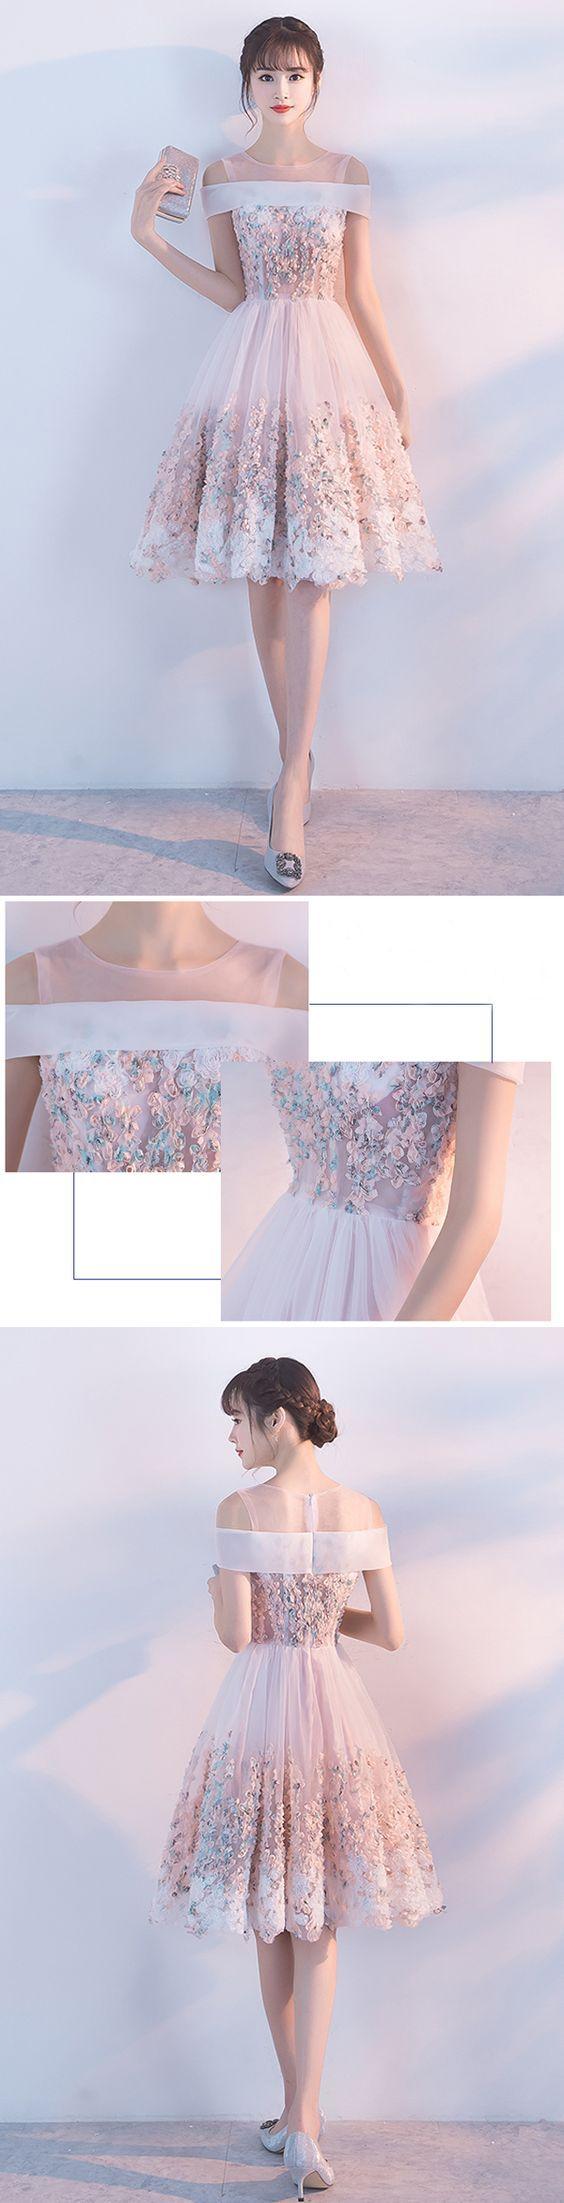 Short Homecoming Dress,Tulle Homecoming Dress, Knee-Length Homecoming Dress, Applique Junior School Dress, Beautiful Homecoming Dress,Pretty Homecoming Dresses,91004